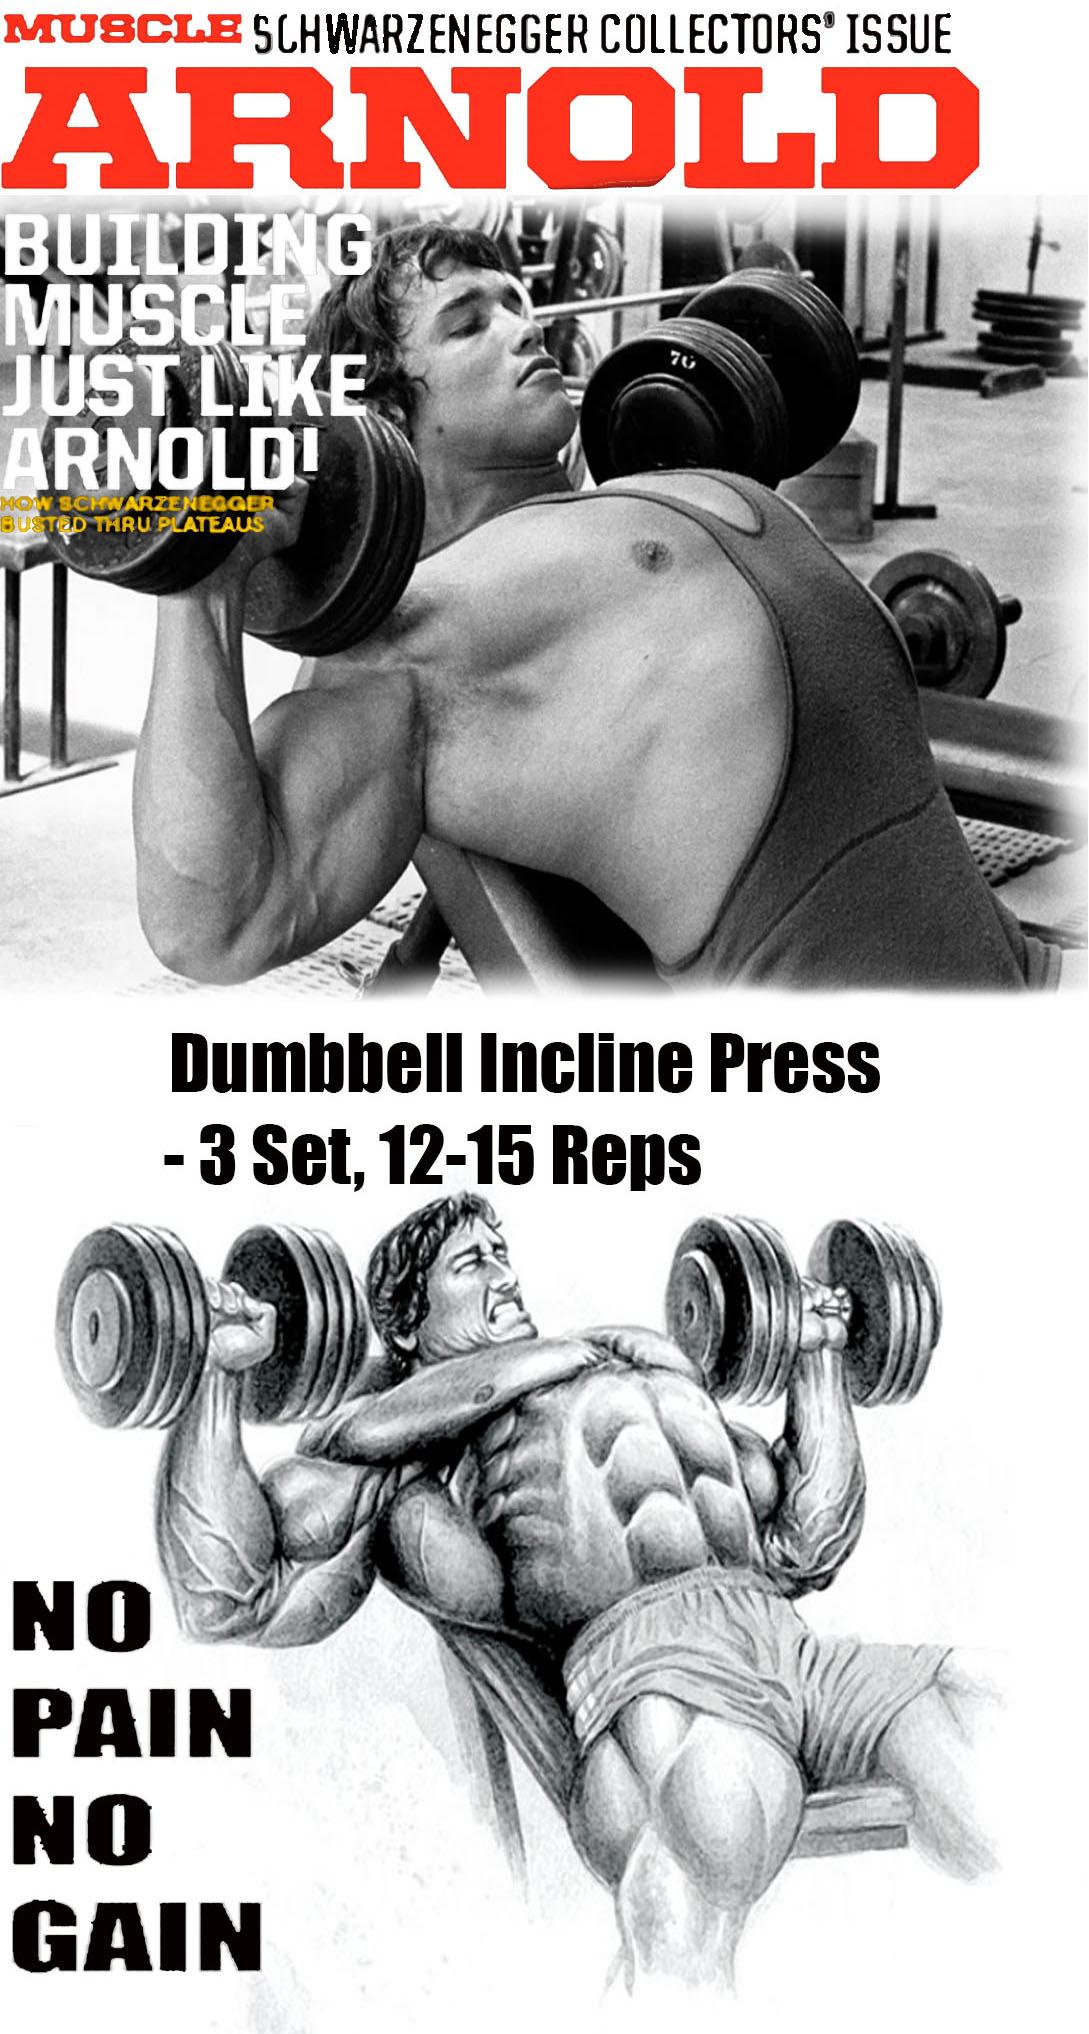 Dumbbell Incline Press